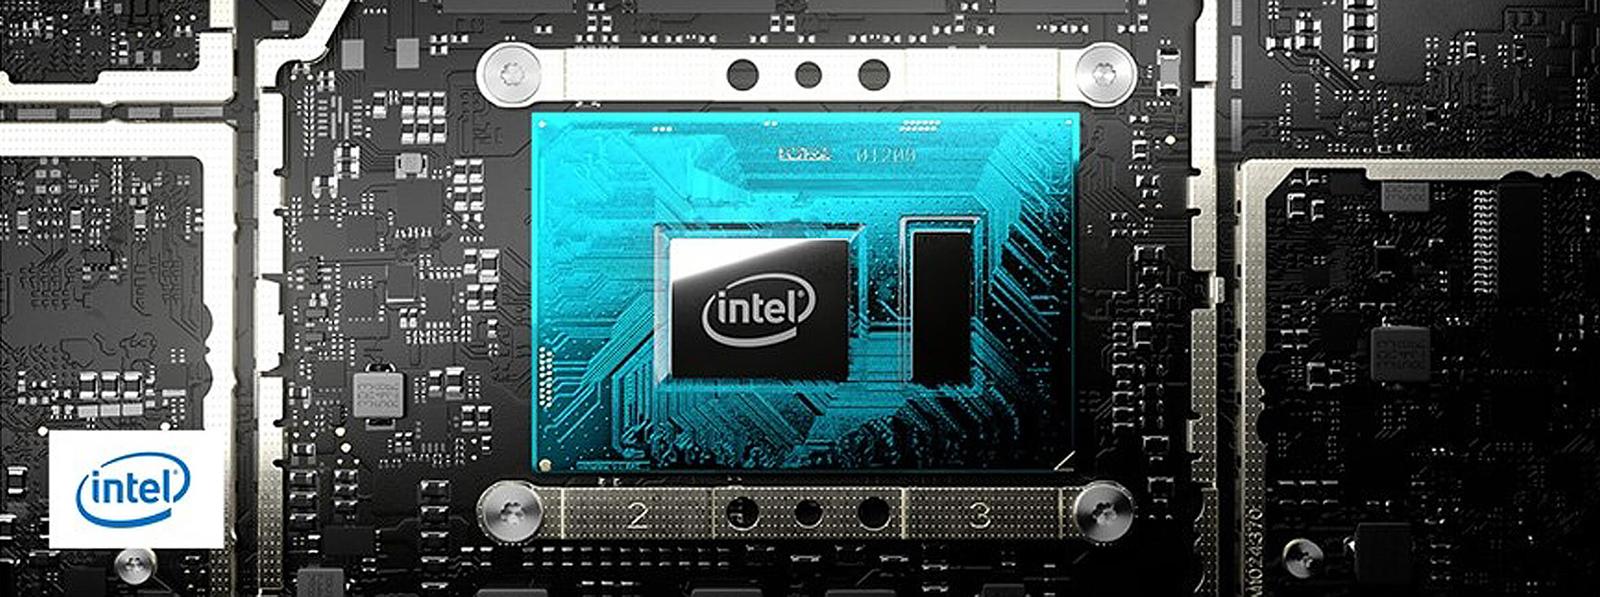 Surface 配备第 10 代英特尔酷睿处理器